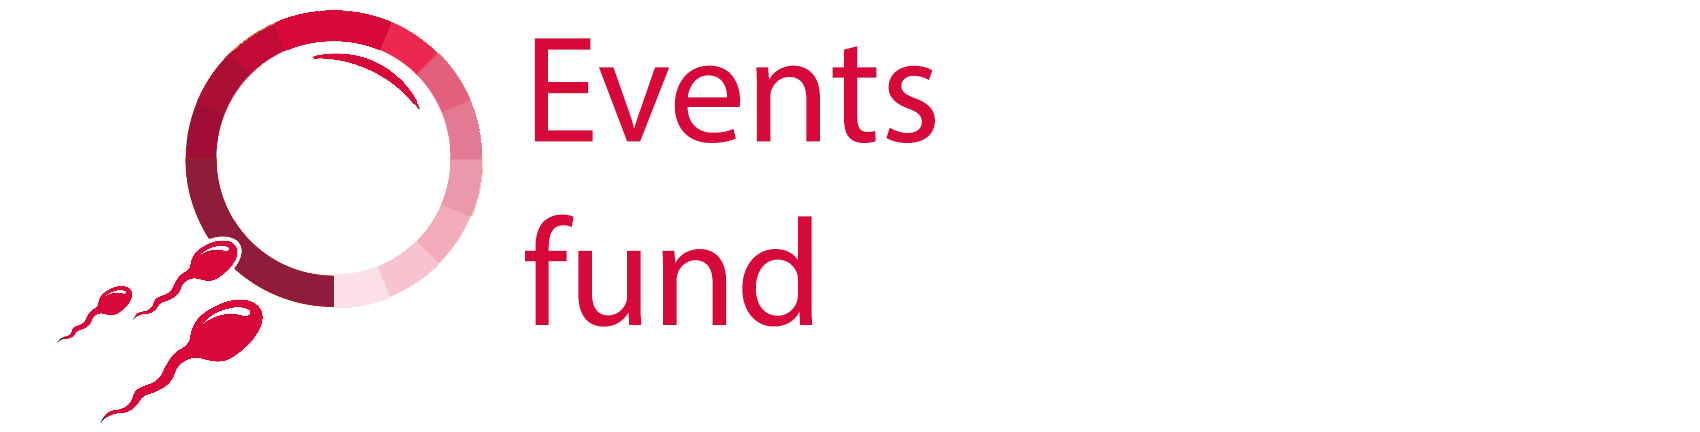 Events fund logo